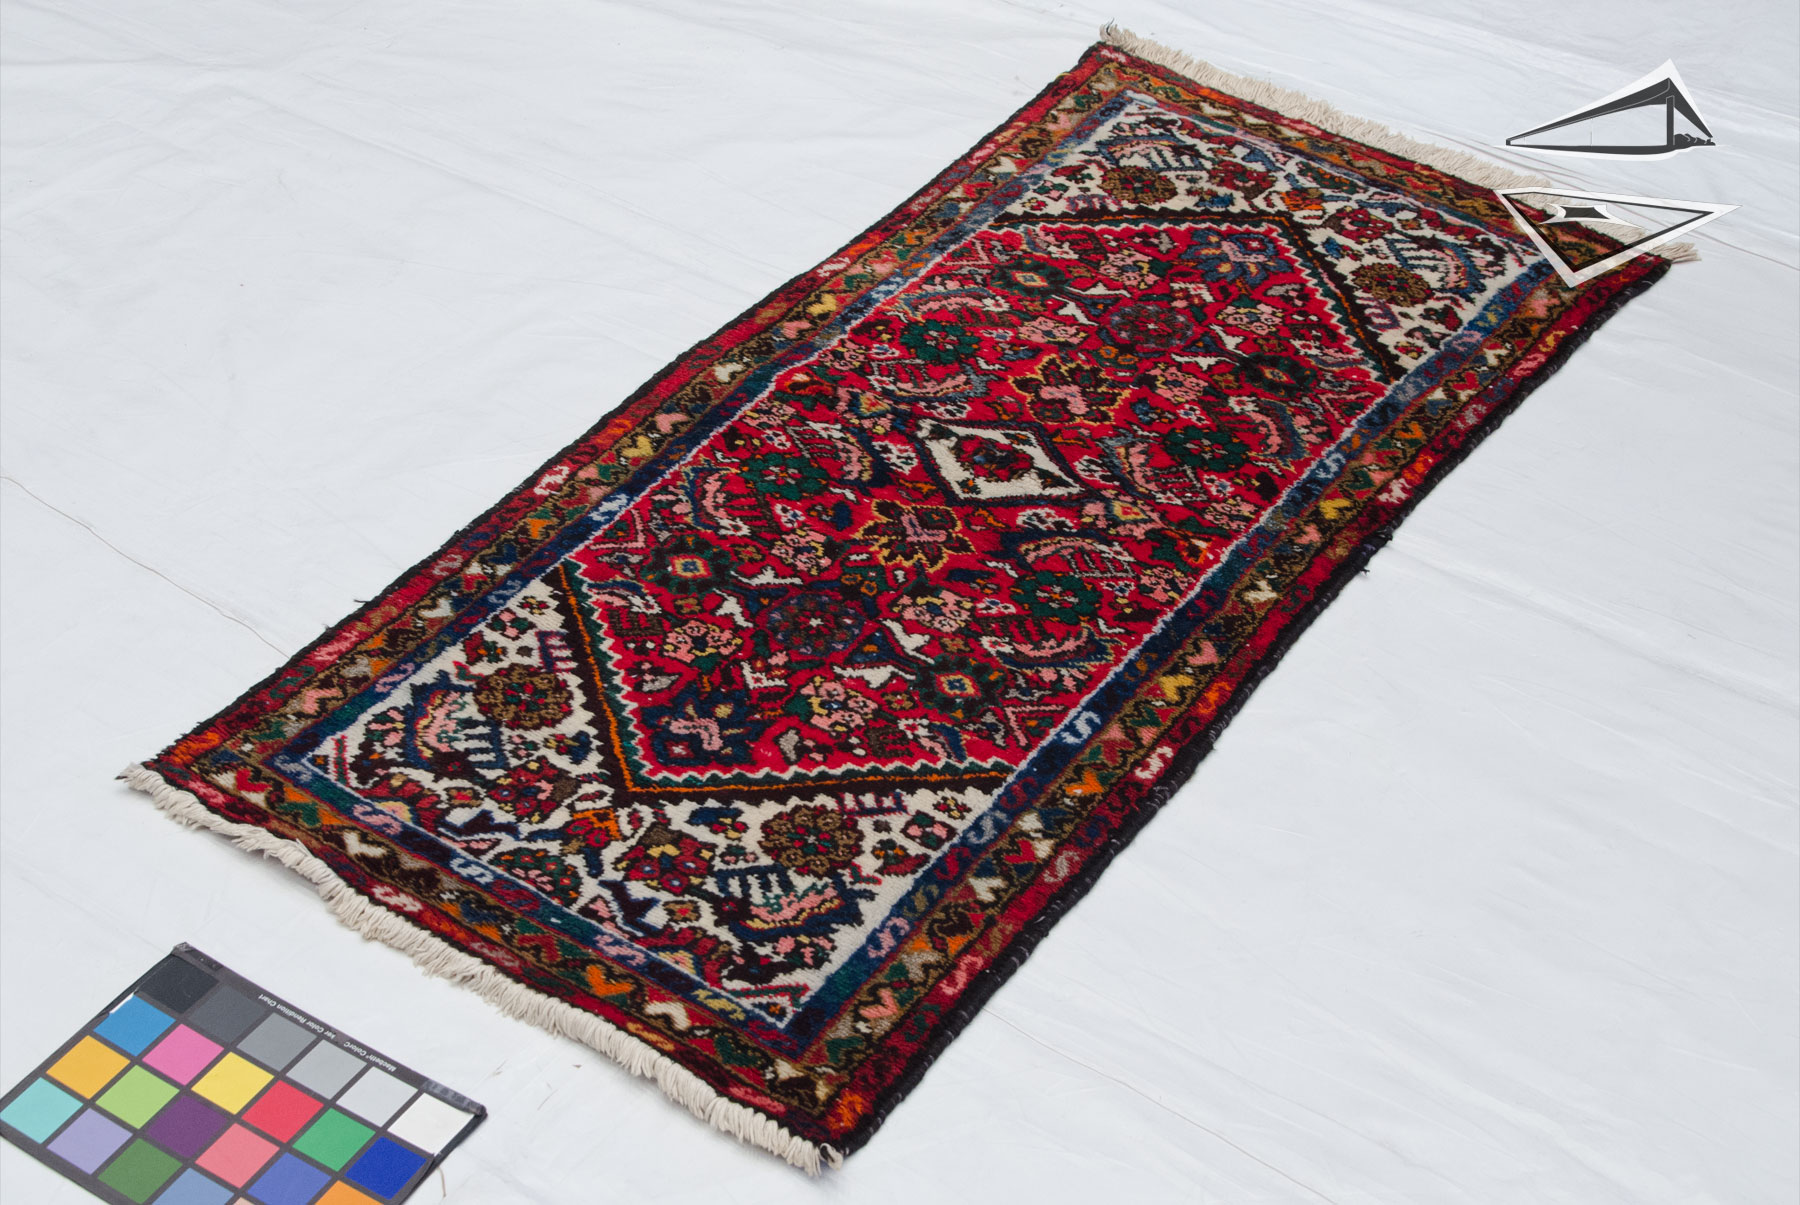 28 2 x 5 runner rugs persian dargezine rug runner 2 5 quot